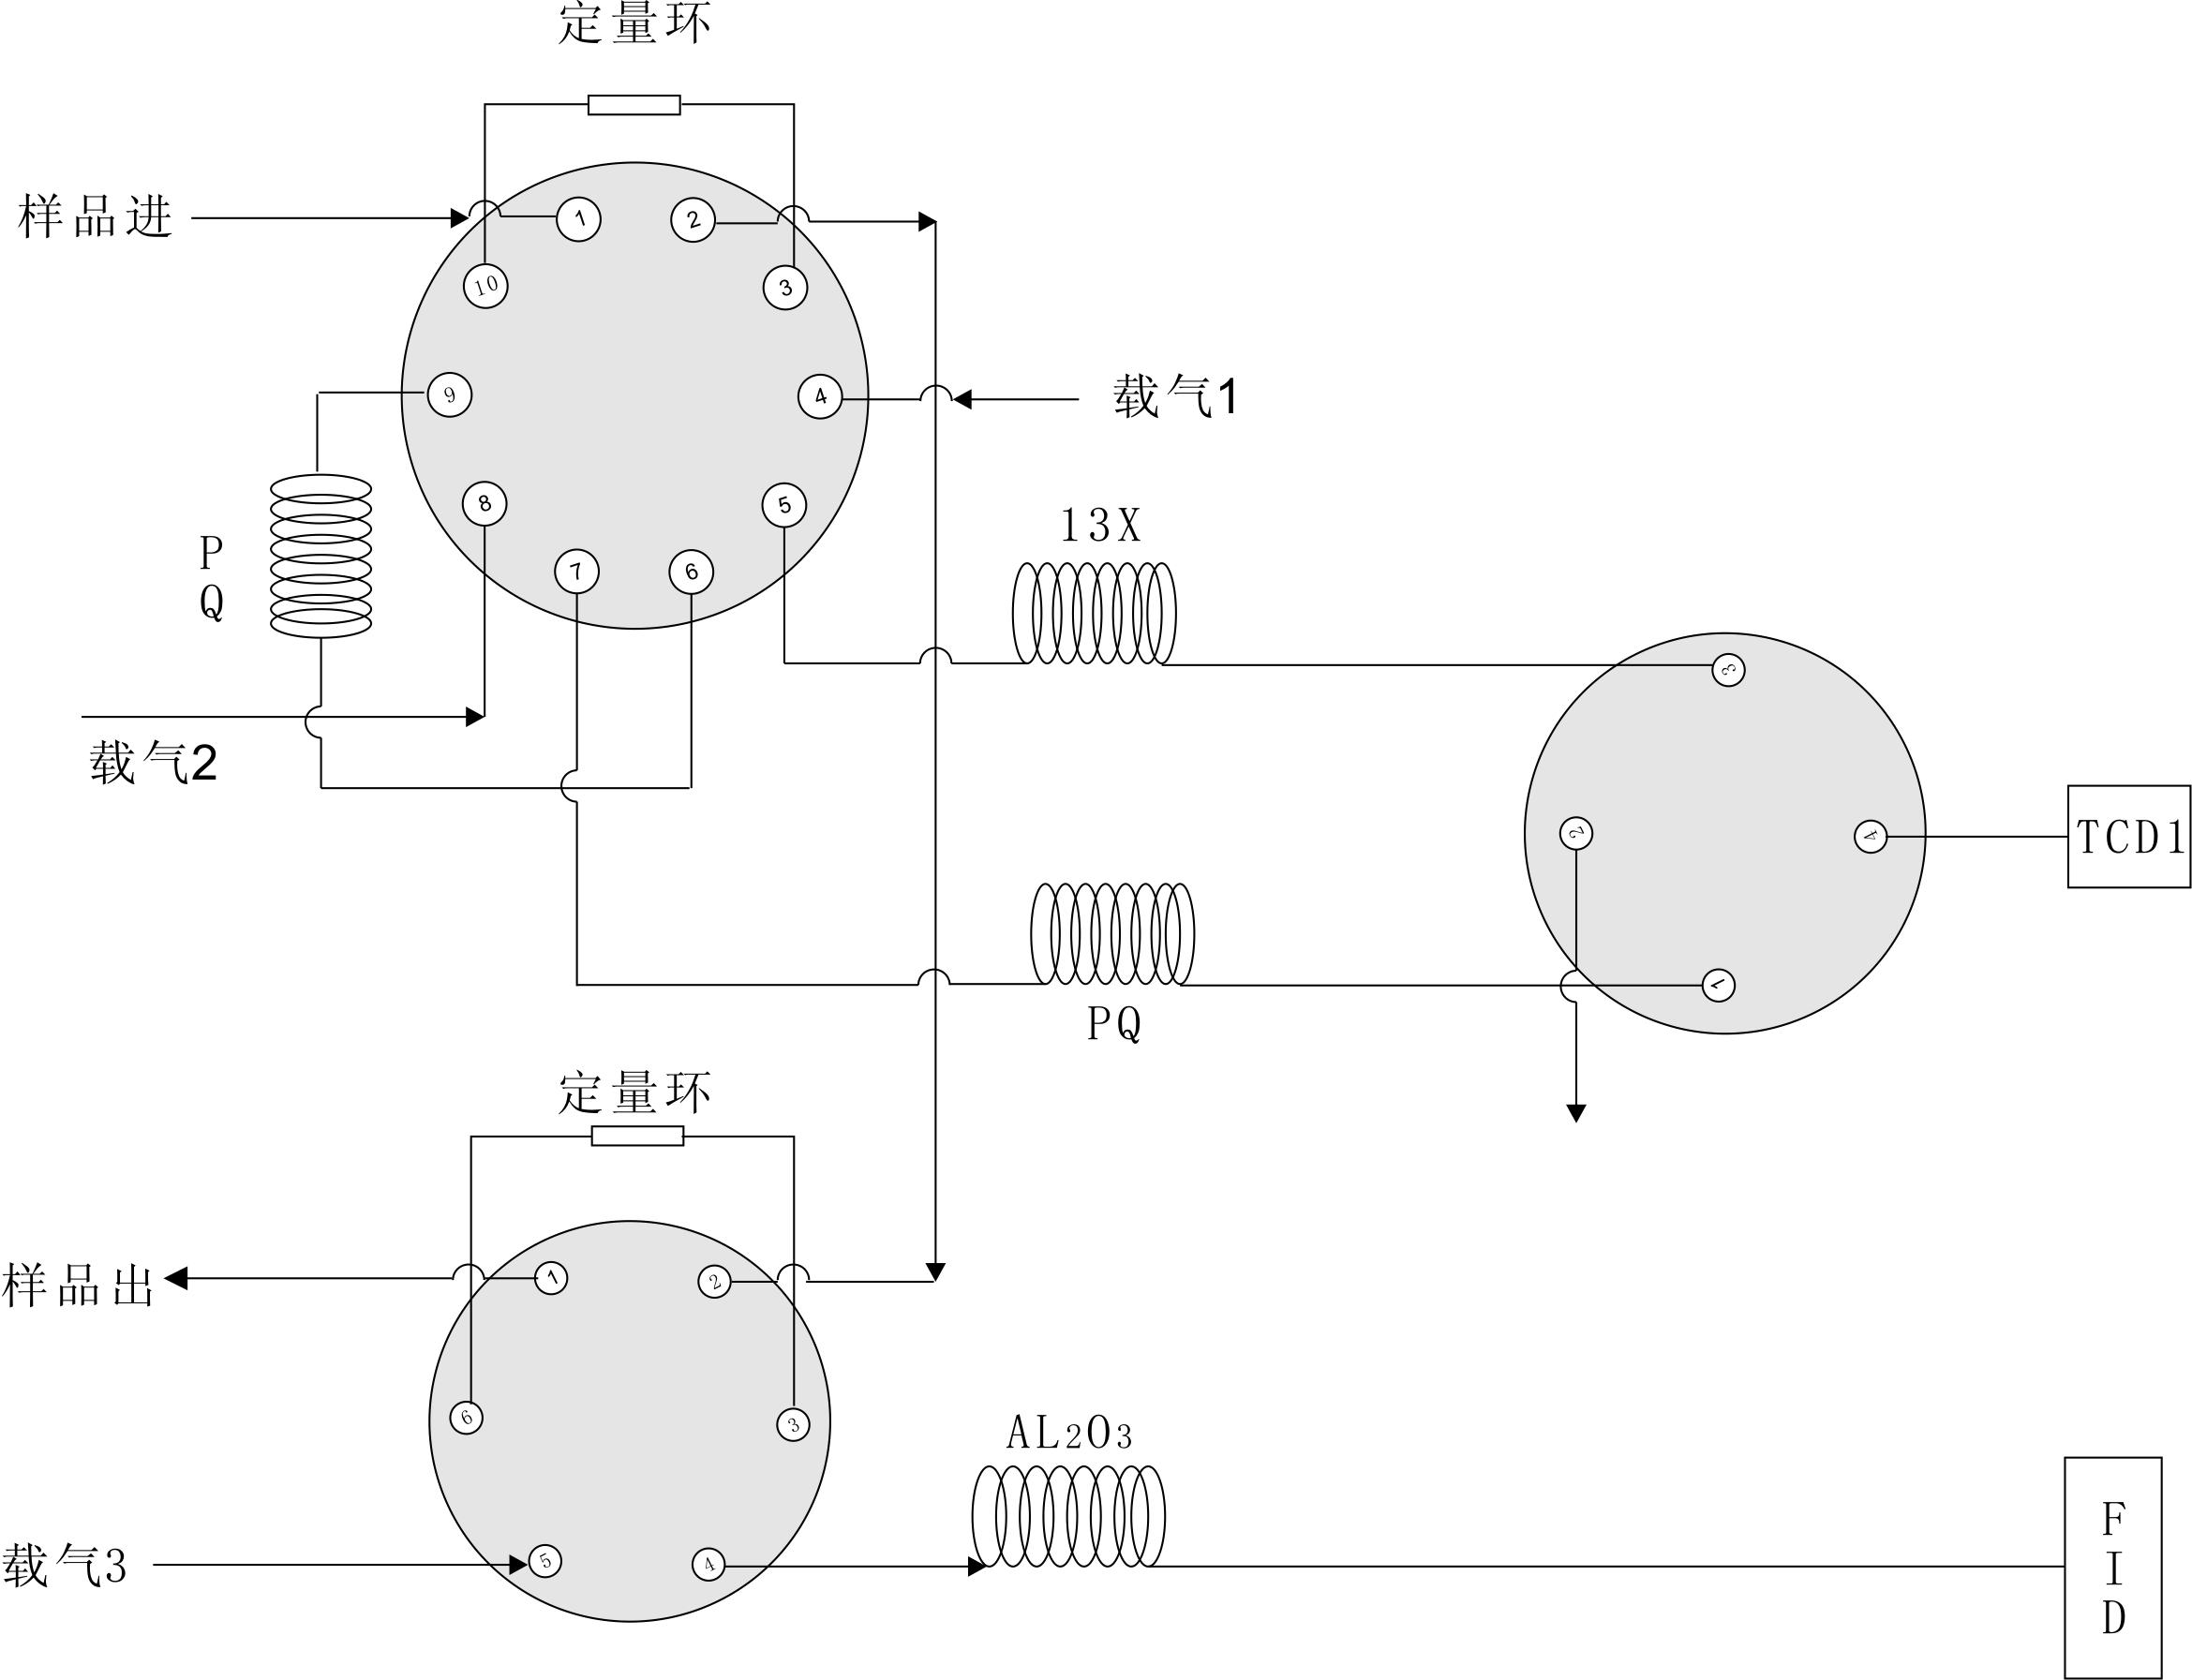 GC-9860燃气色谱分析系统的方法简述: (1)系统采用是十通阀切割流程,这样保证了CO2不流入分子筛色谱柱中而被吸附,导致分子筛柱子CO2中毒。色谱柱2为PN柱子,主要用来把H2、O2、N2、CH4、 CO与CO2及CnHm预分离开,当CO流出PN柱时十通阀自动切割,H2-CO进入色谱柱1(分子筛)继续分离,进入TCD中检测。而CO2在PN柱中继续分离进入TCD检测。 (2)下部分系统采用六通阀进样,通过AL2O3毛细管色谱柱对CnHm进行分离,通过氢火焰检测器进行检测。 GC-9860燃气色谱